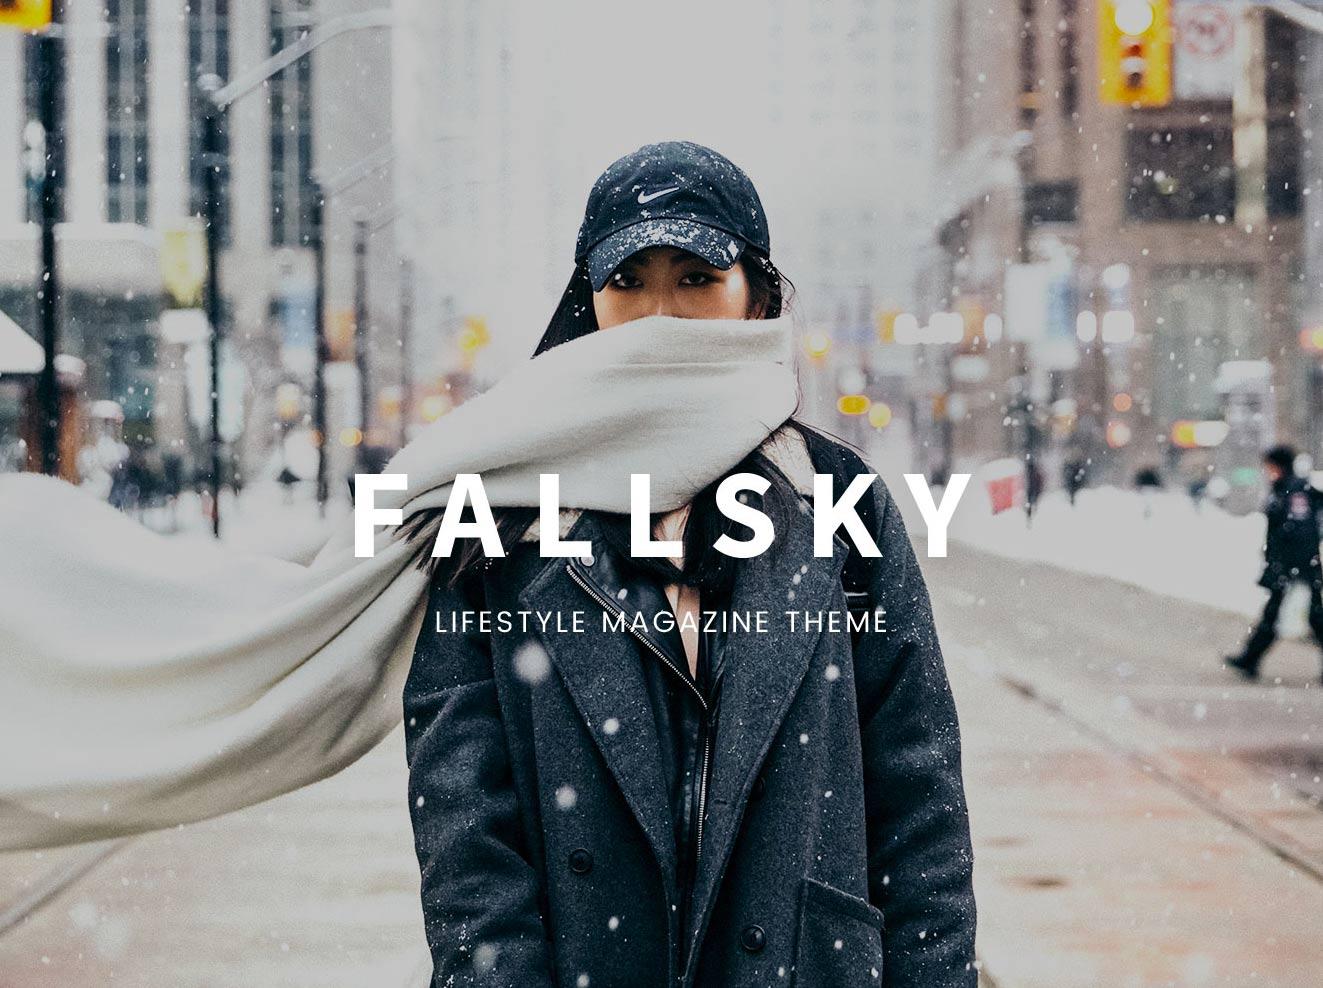 """Fallsky"